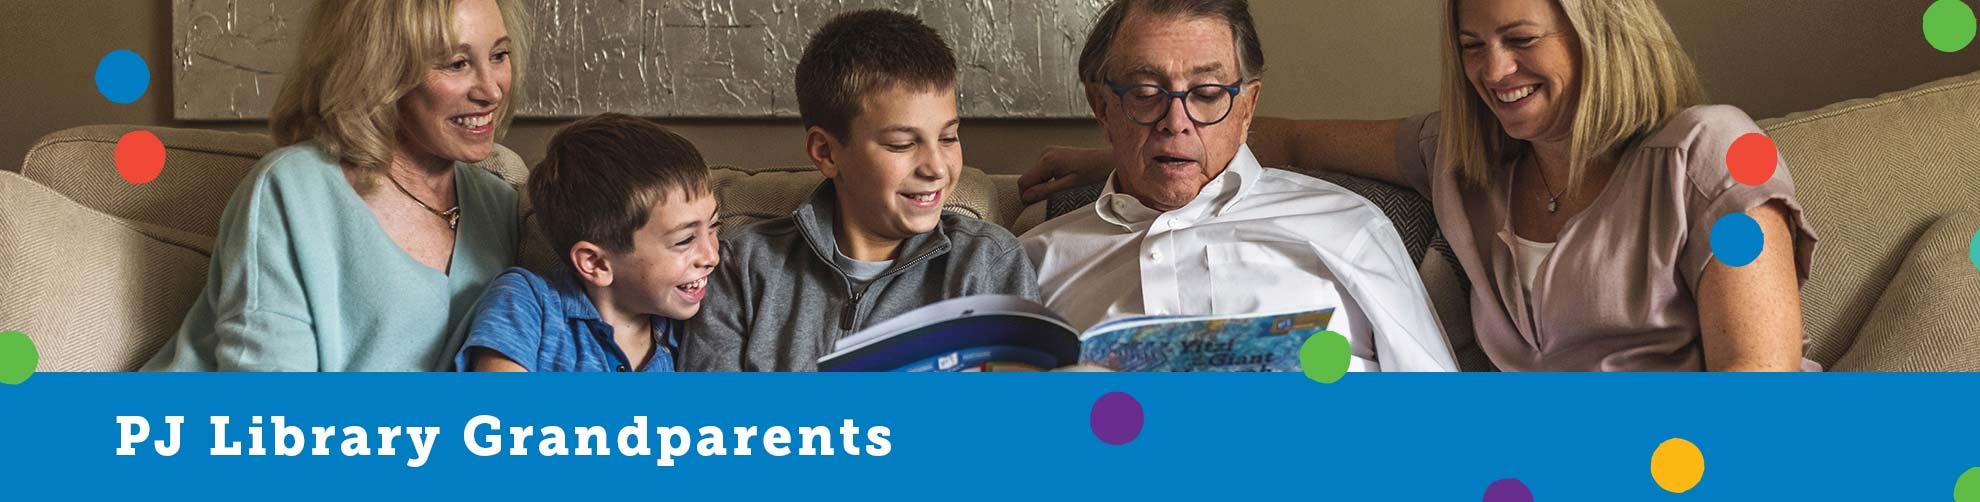 pj-library-grandparents